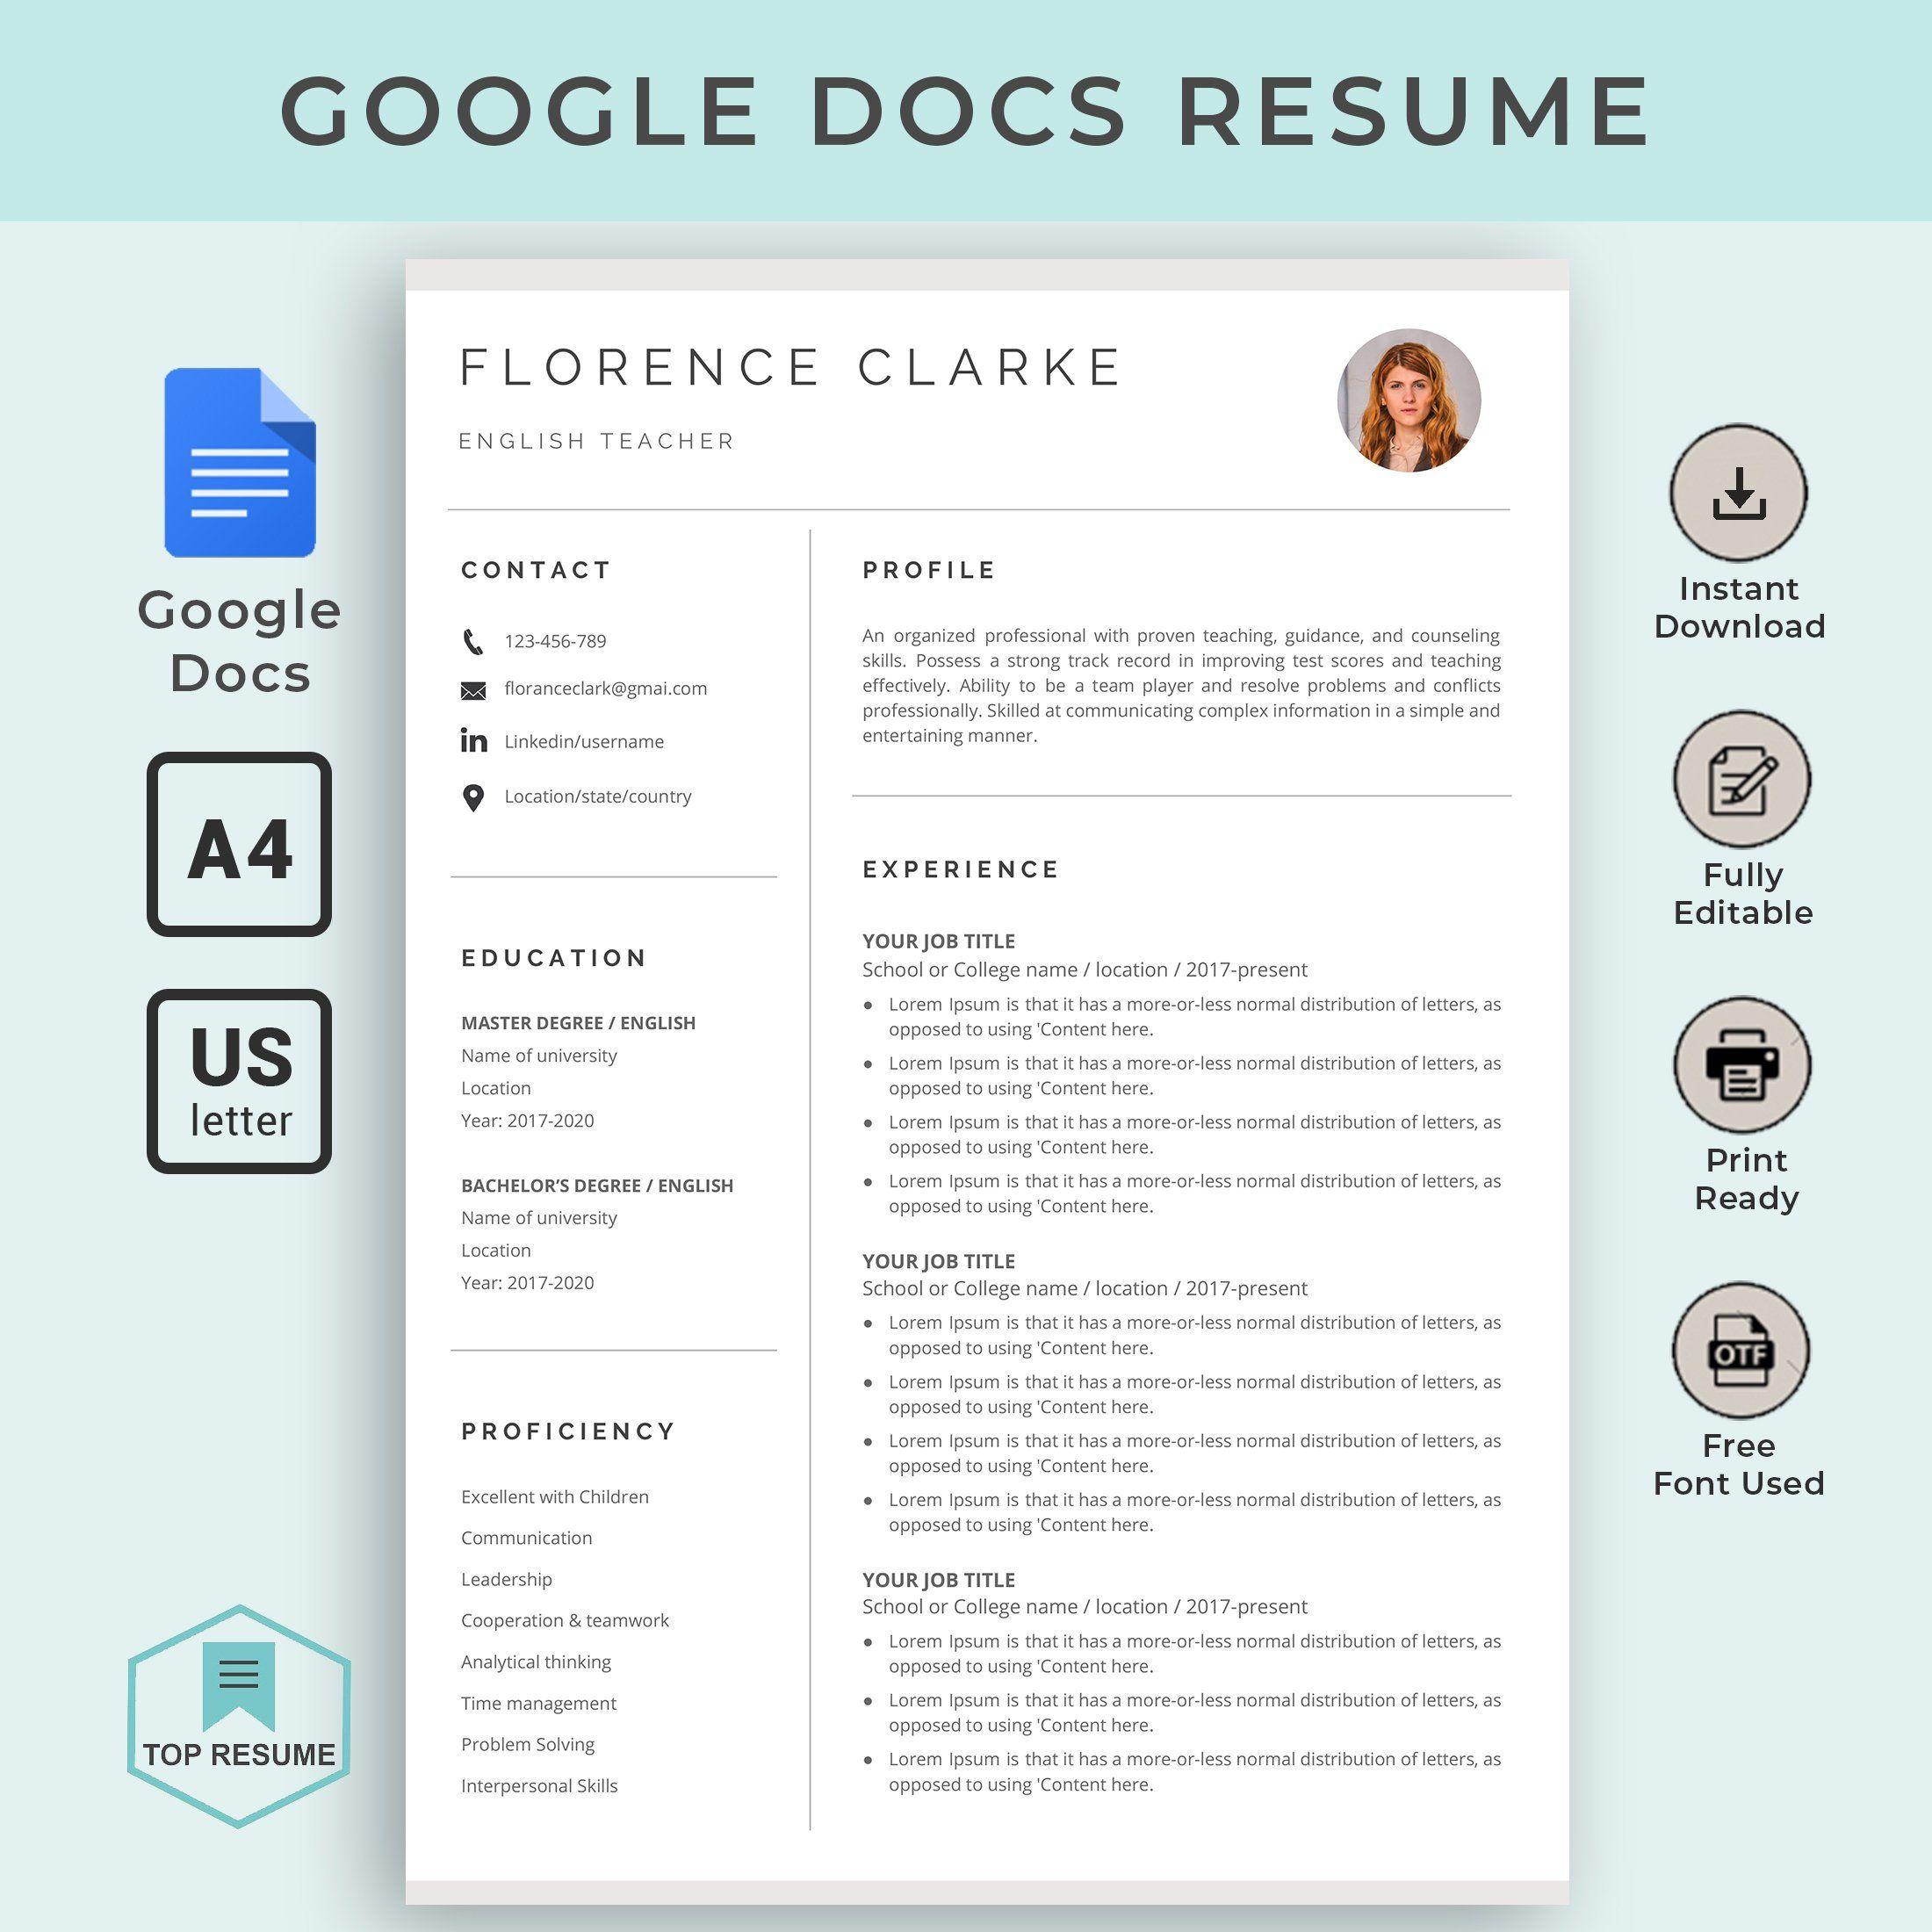 Google Docs Resume Google Docs Resume Template Google Docs Template Instant Downlo Resume Template Word Teacher Resume Template Downloadable Resume Template